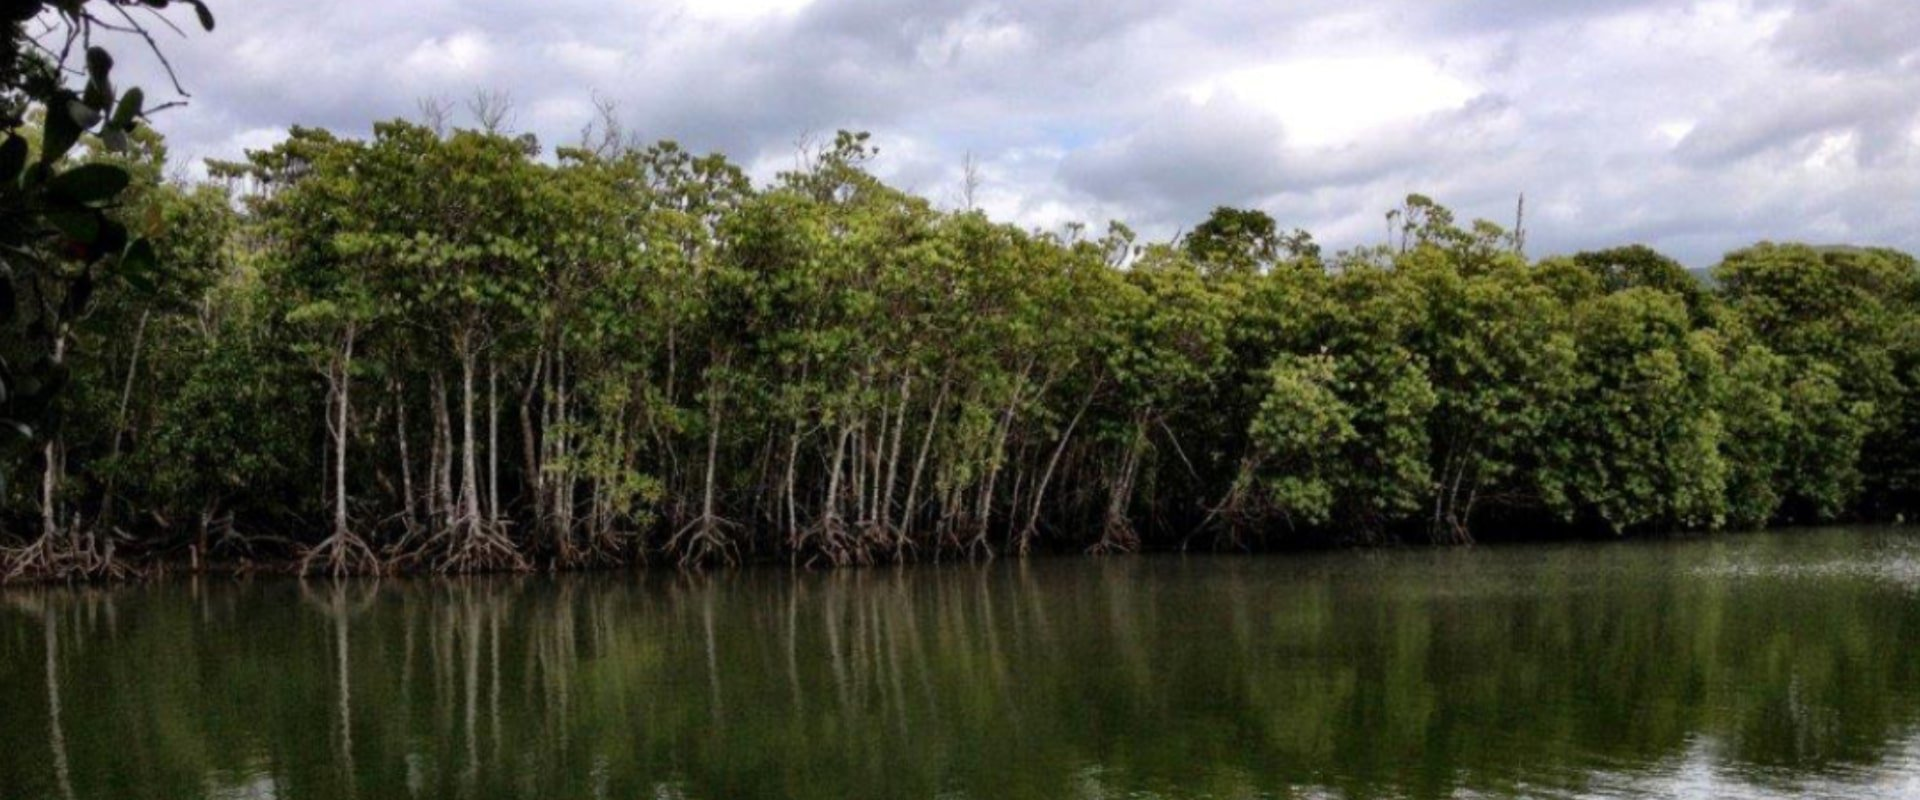 Hike to the Mngazana Mangrove